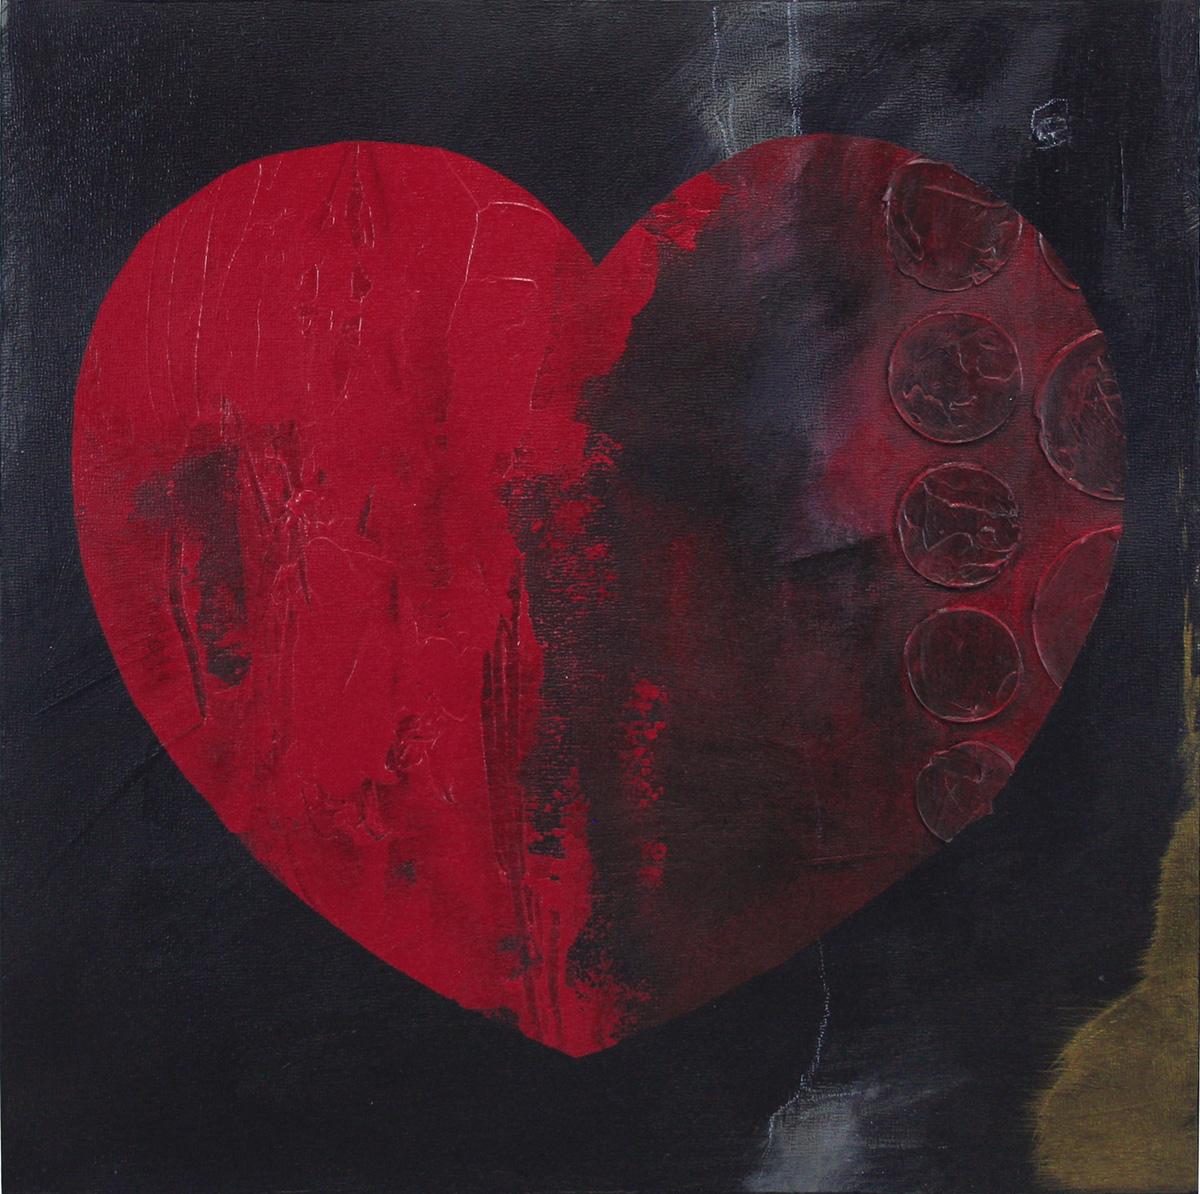 Heart 2013